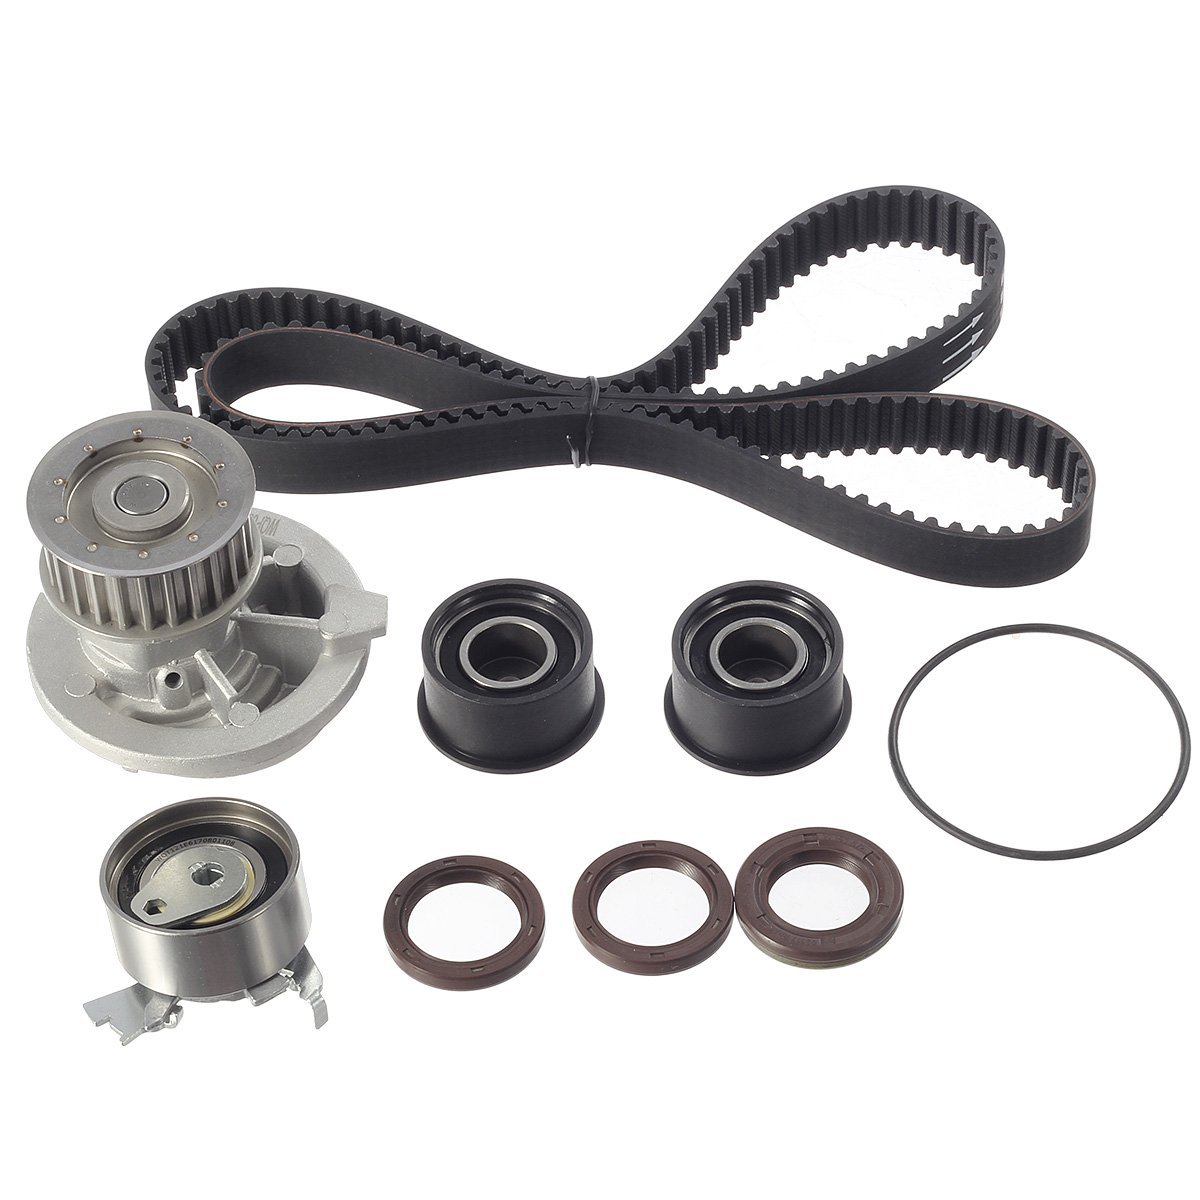 Motorhot 92063917 92064250 Timing Belt Kit Water Pump Fits 2004 For Suzuki Forenza 2005 Chevrolet Optra 04